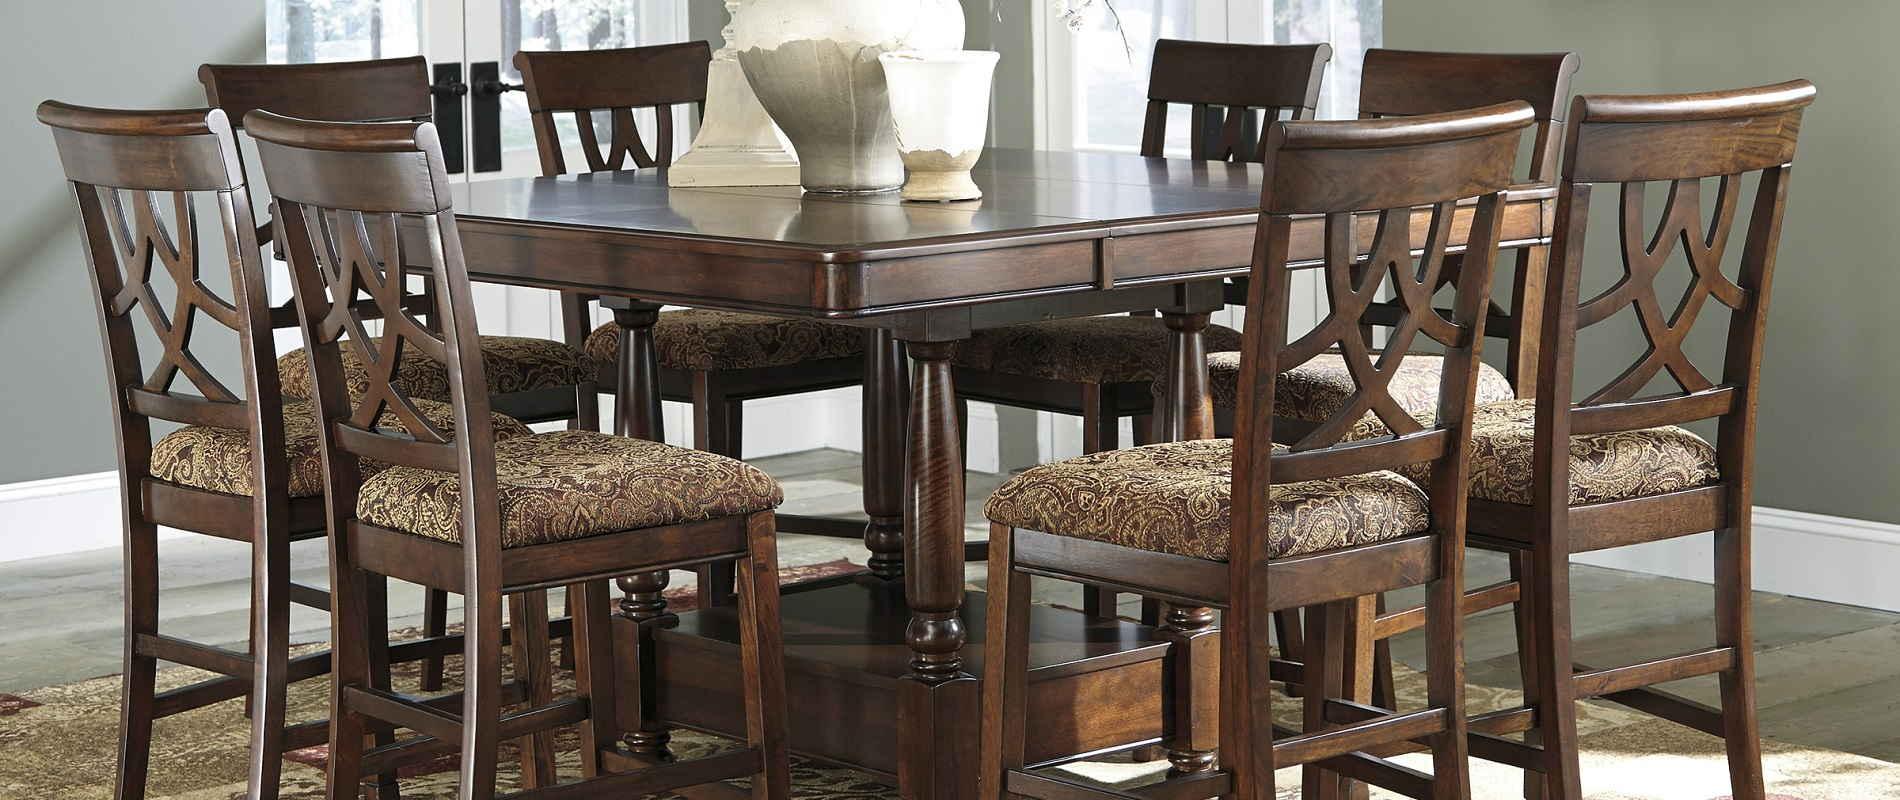 Incroyable Furniture Store | Decatur, AL | Cornerstone Furniture Inc